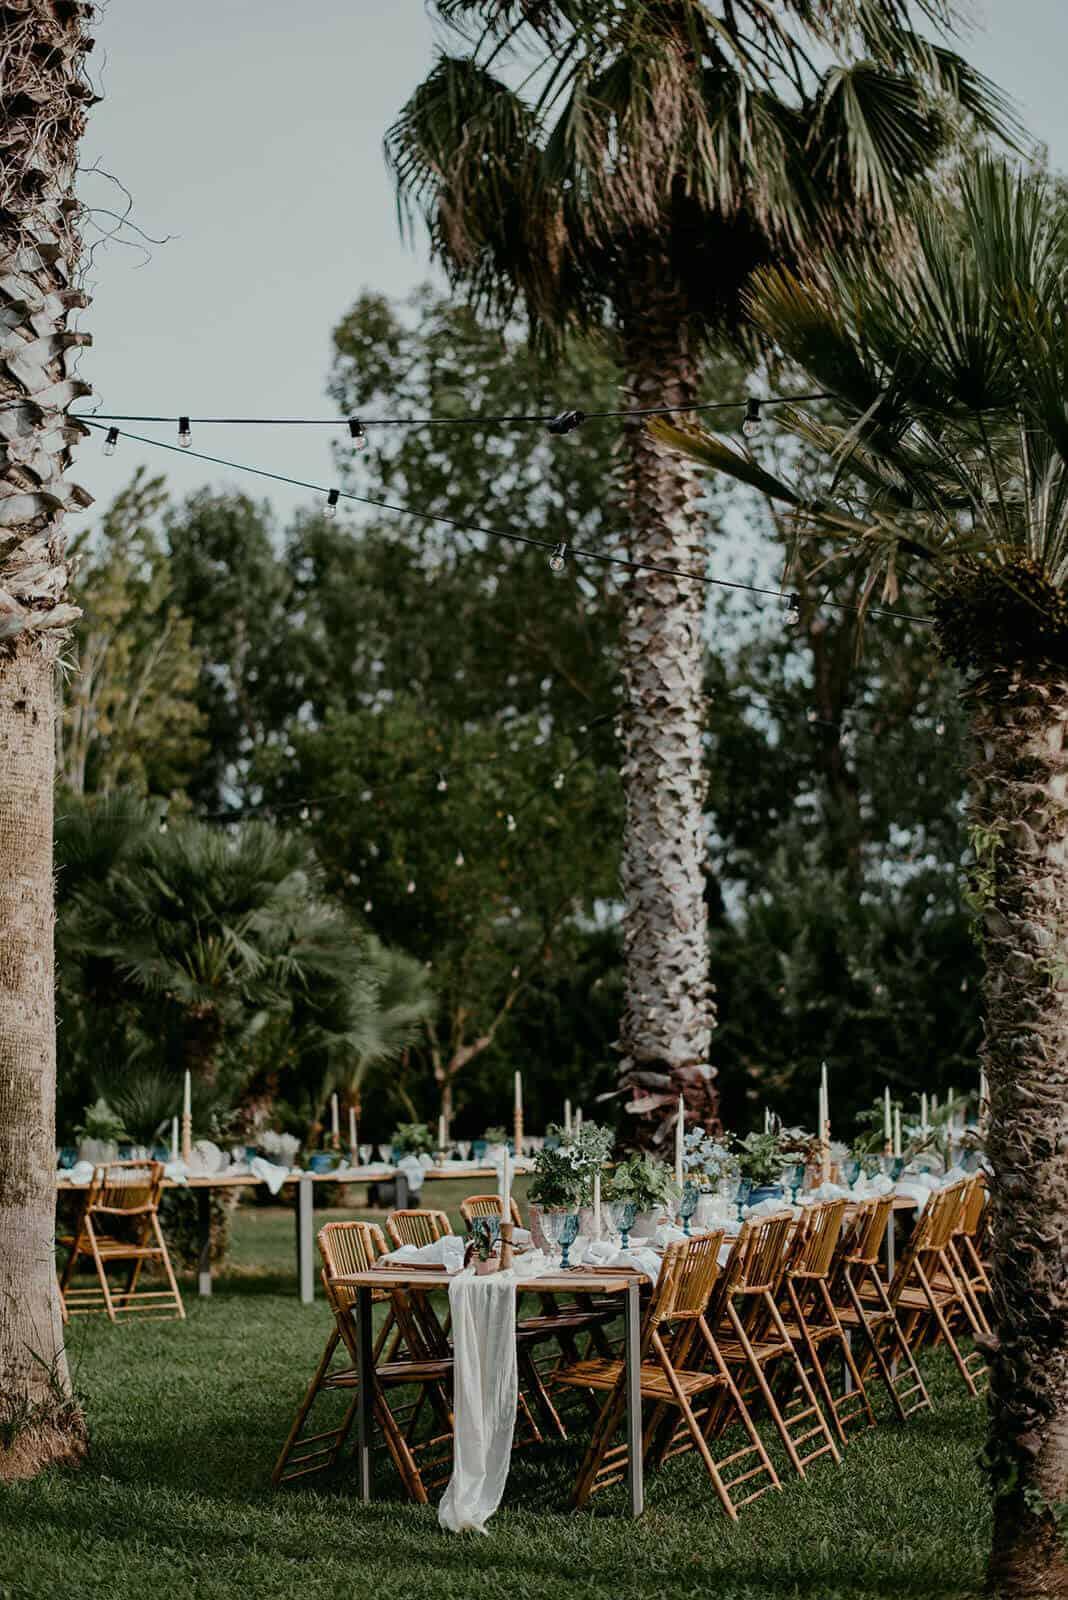 casaments jardí banquet castell Cortal gran